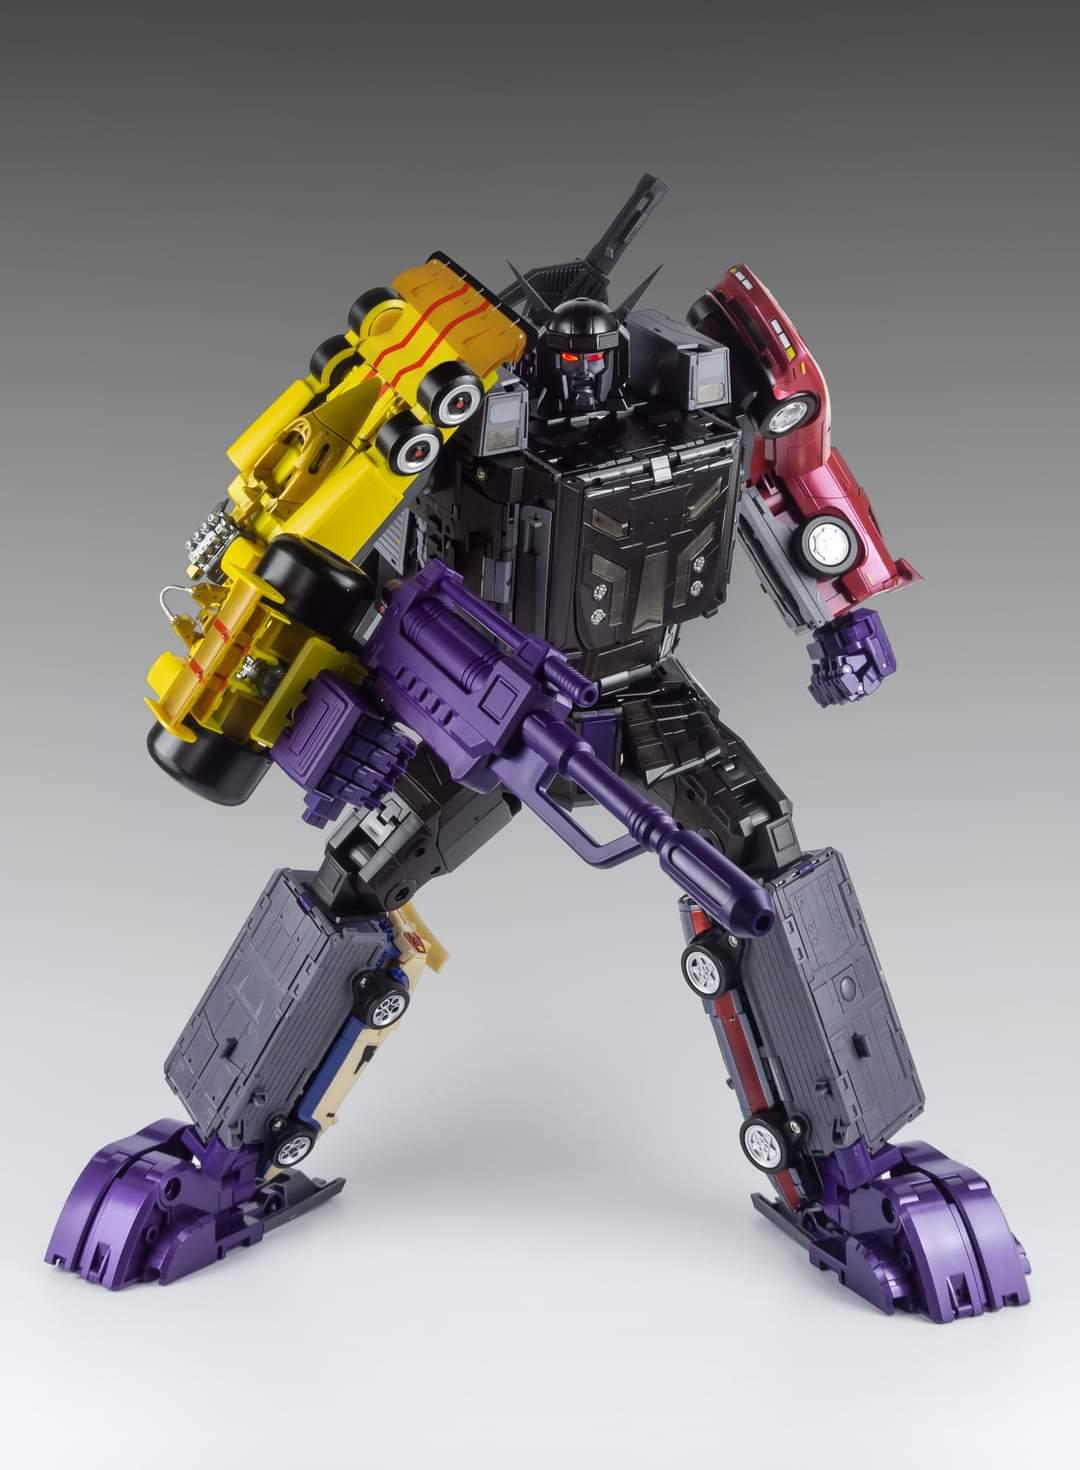 [X-Transbots] Produit Tiers - Jouets Berserkars forme Monolith (MX-XIII à MX-VII) - aka Stunticons forme Menasor/Menaseur - Page 7 M0mtm0OE_o